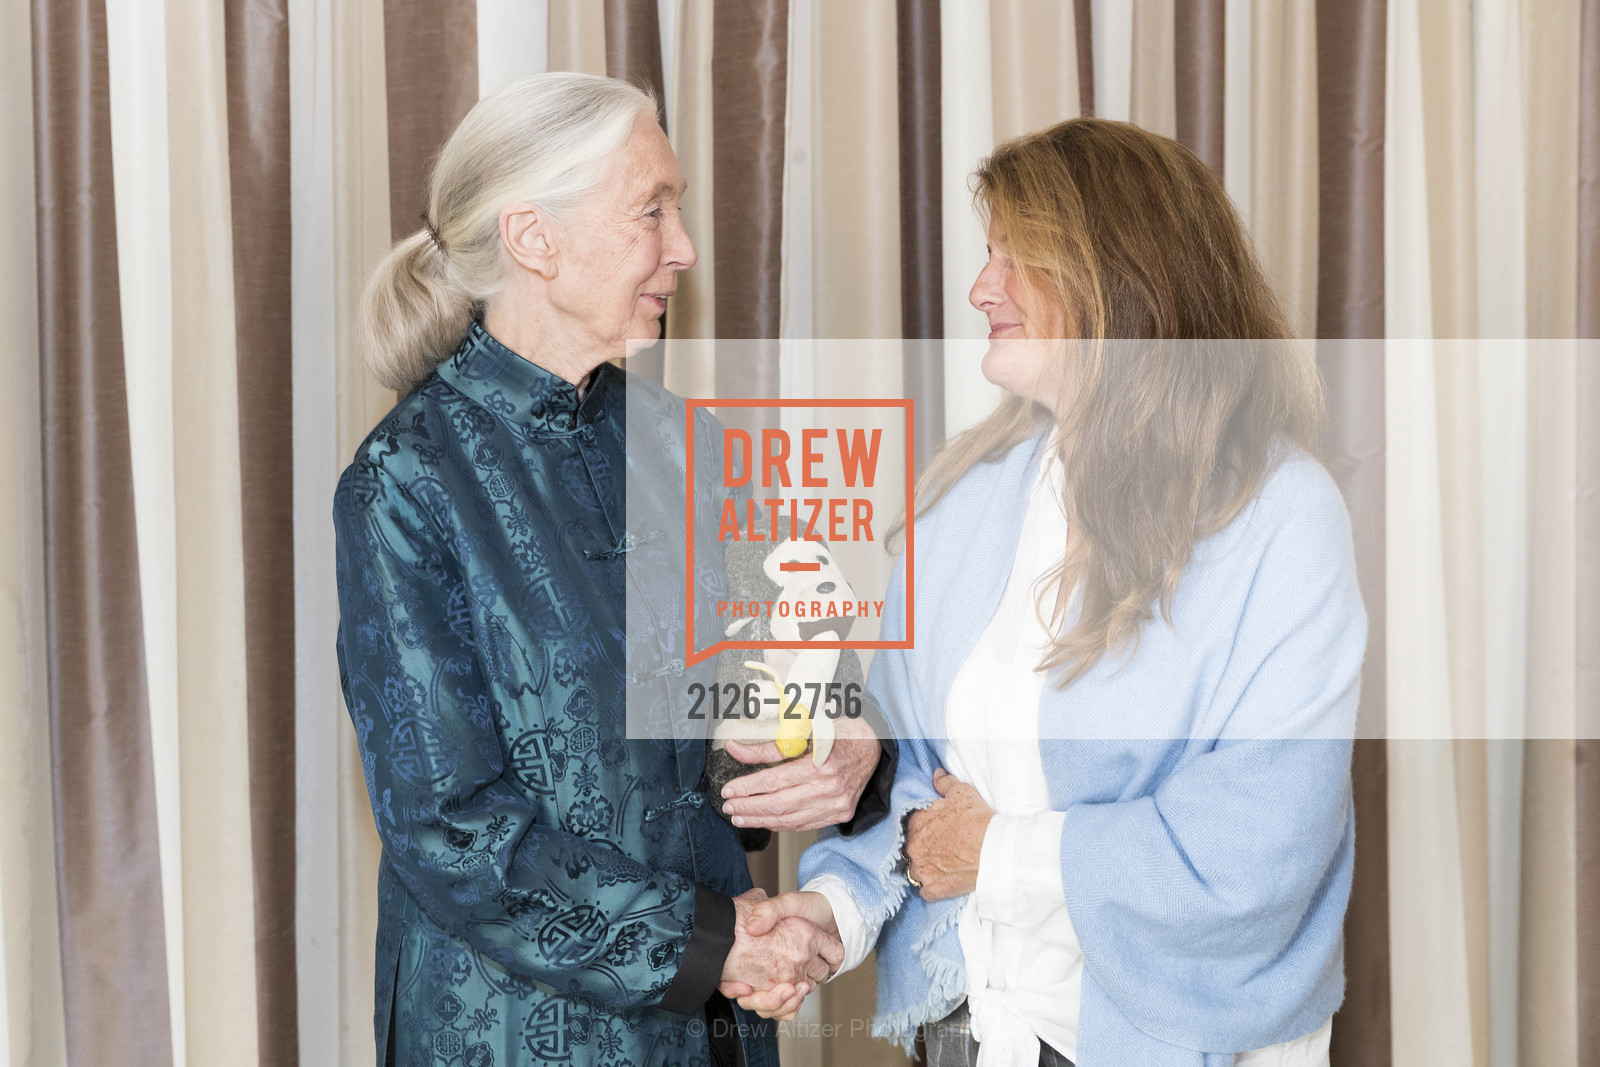 Jane Goodall, Elizabeth Nordlinger, Photo #2126-2756